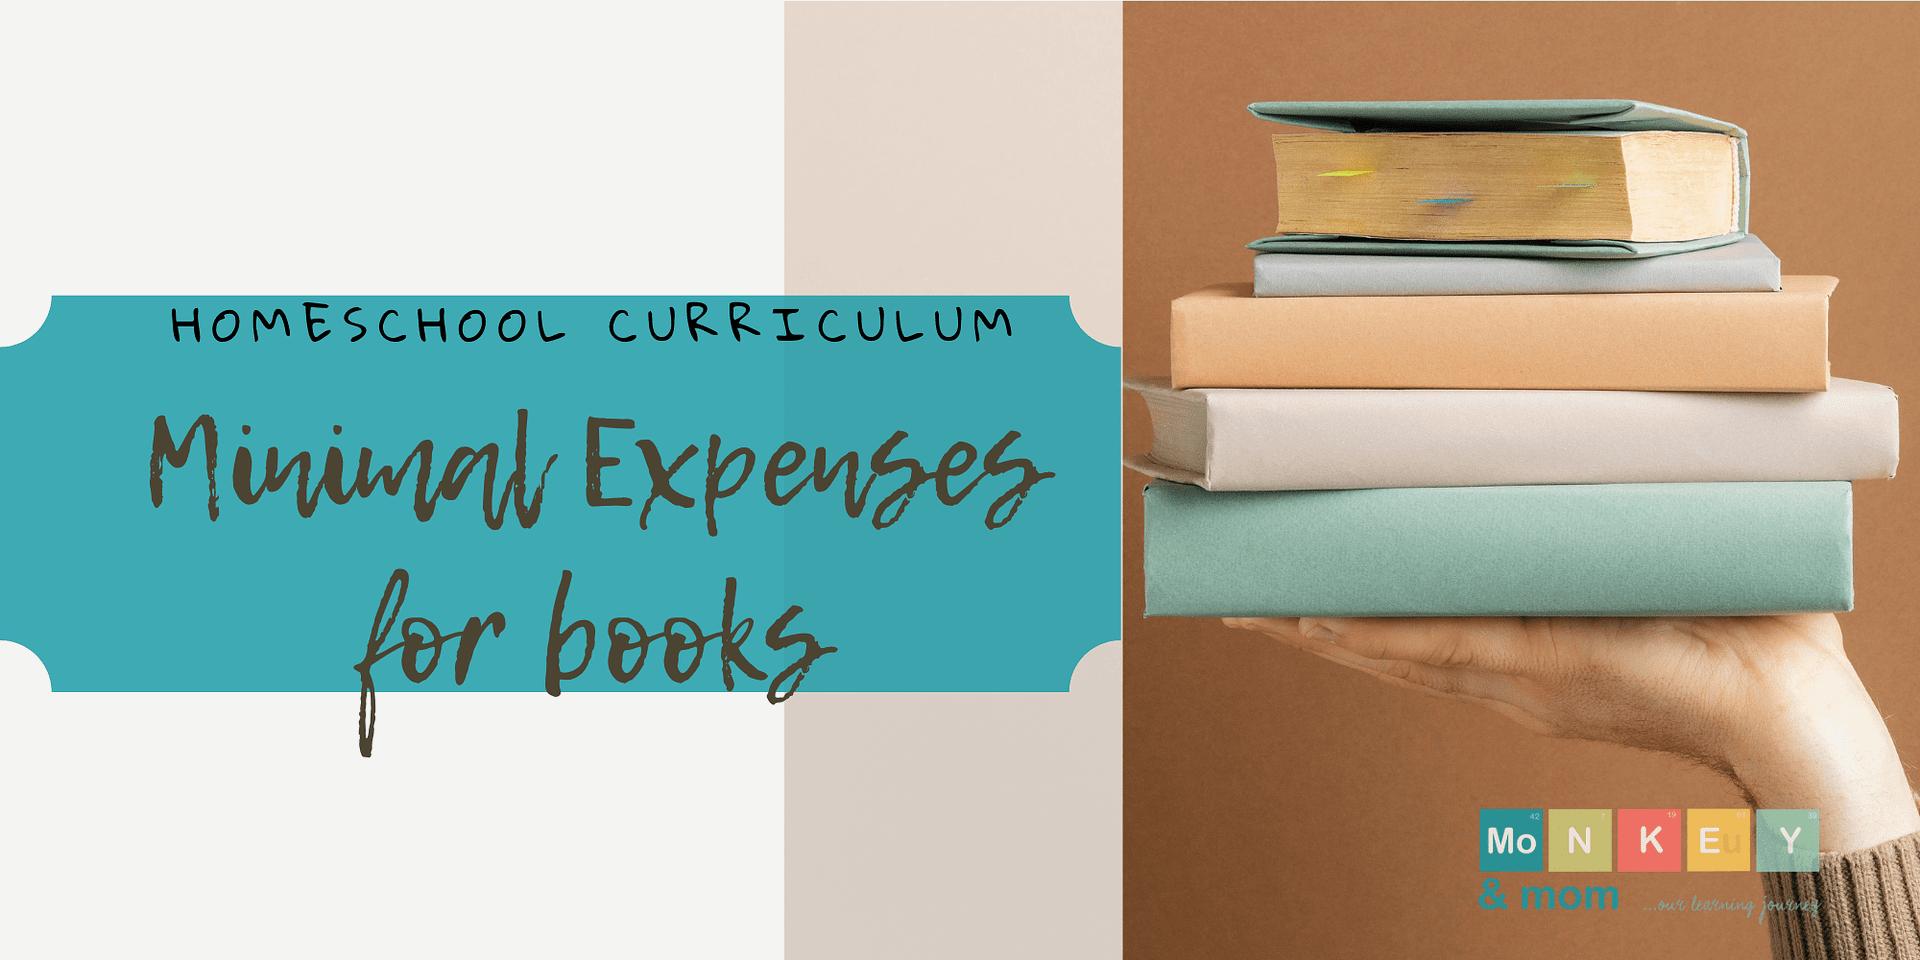 Minimal Expenses Homeschool